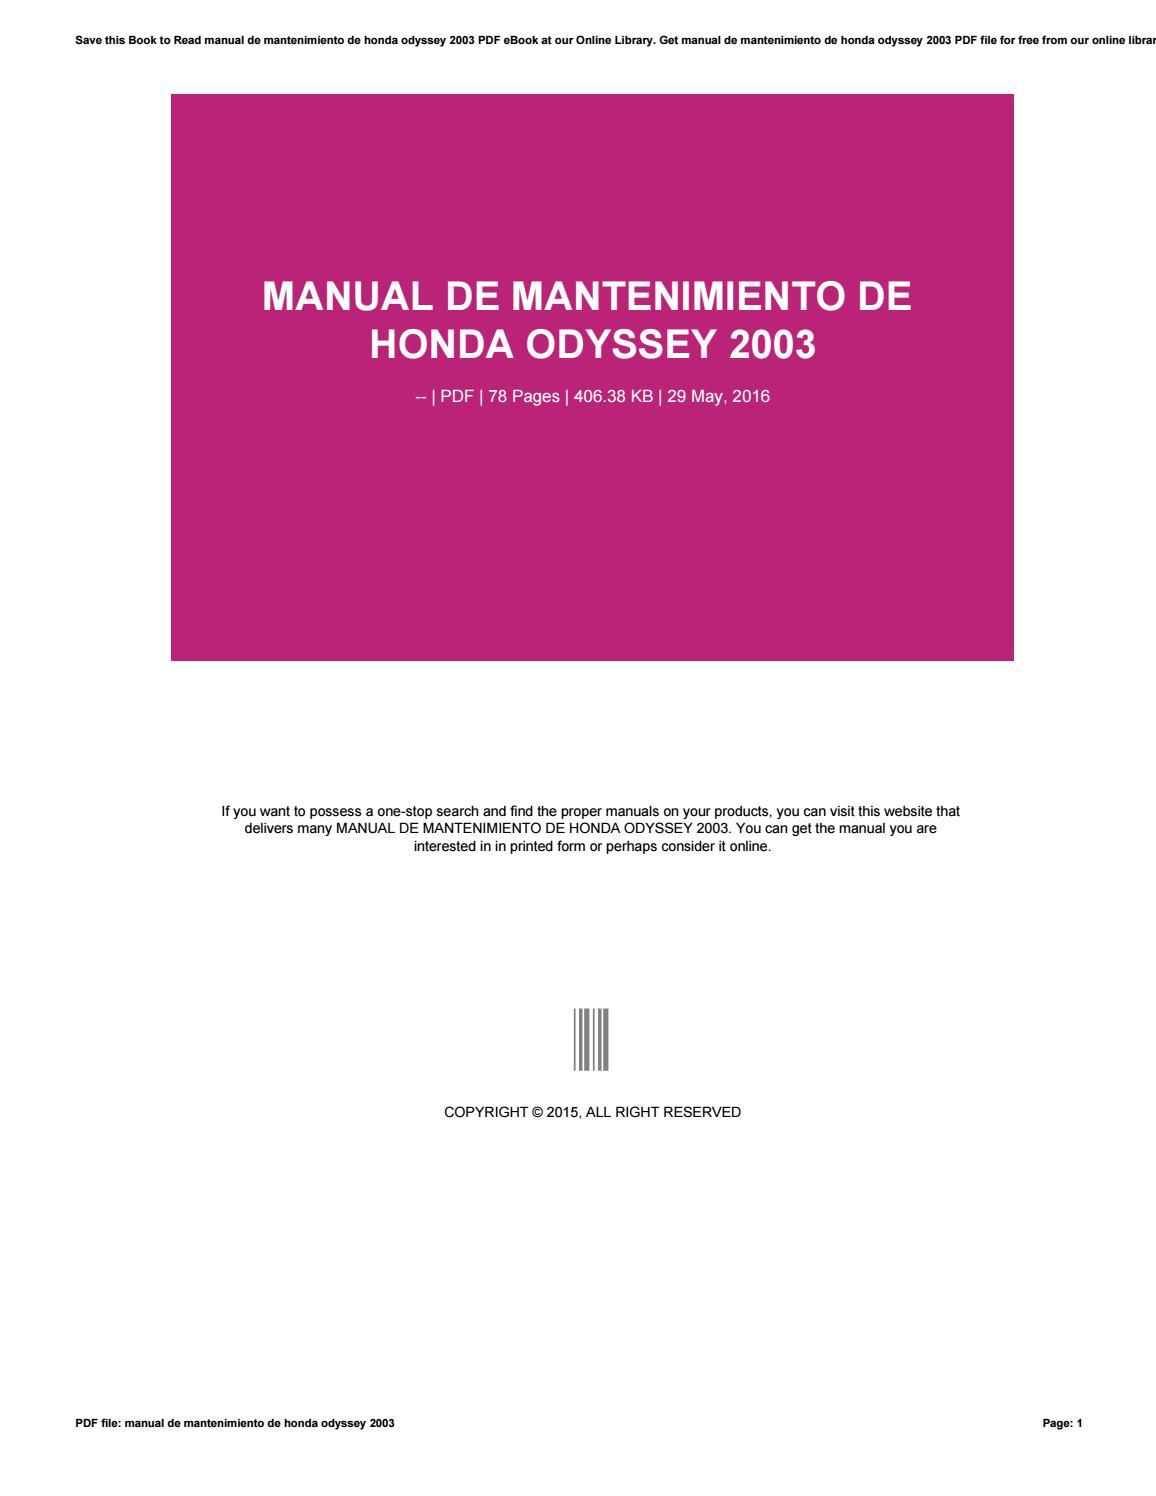 2003 Honda Odyssey Intake Manifold Service and Repair ...